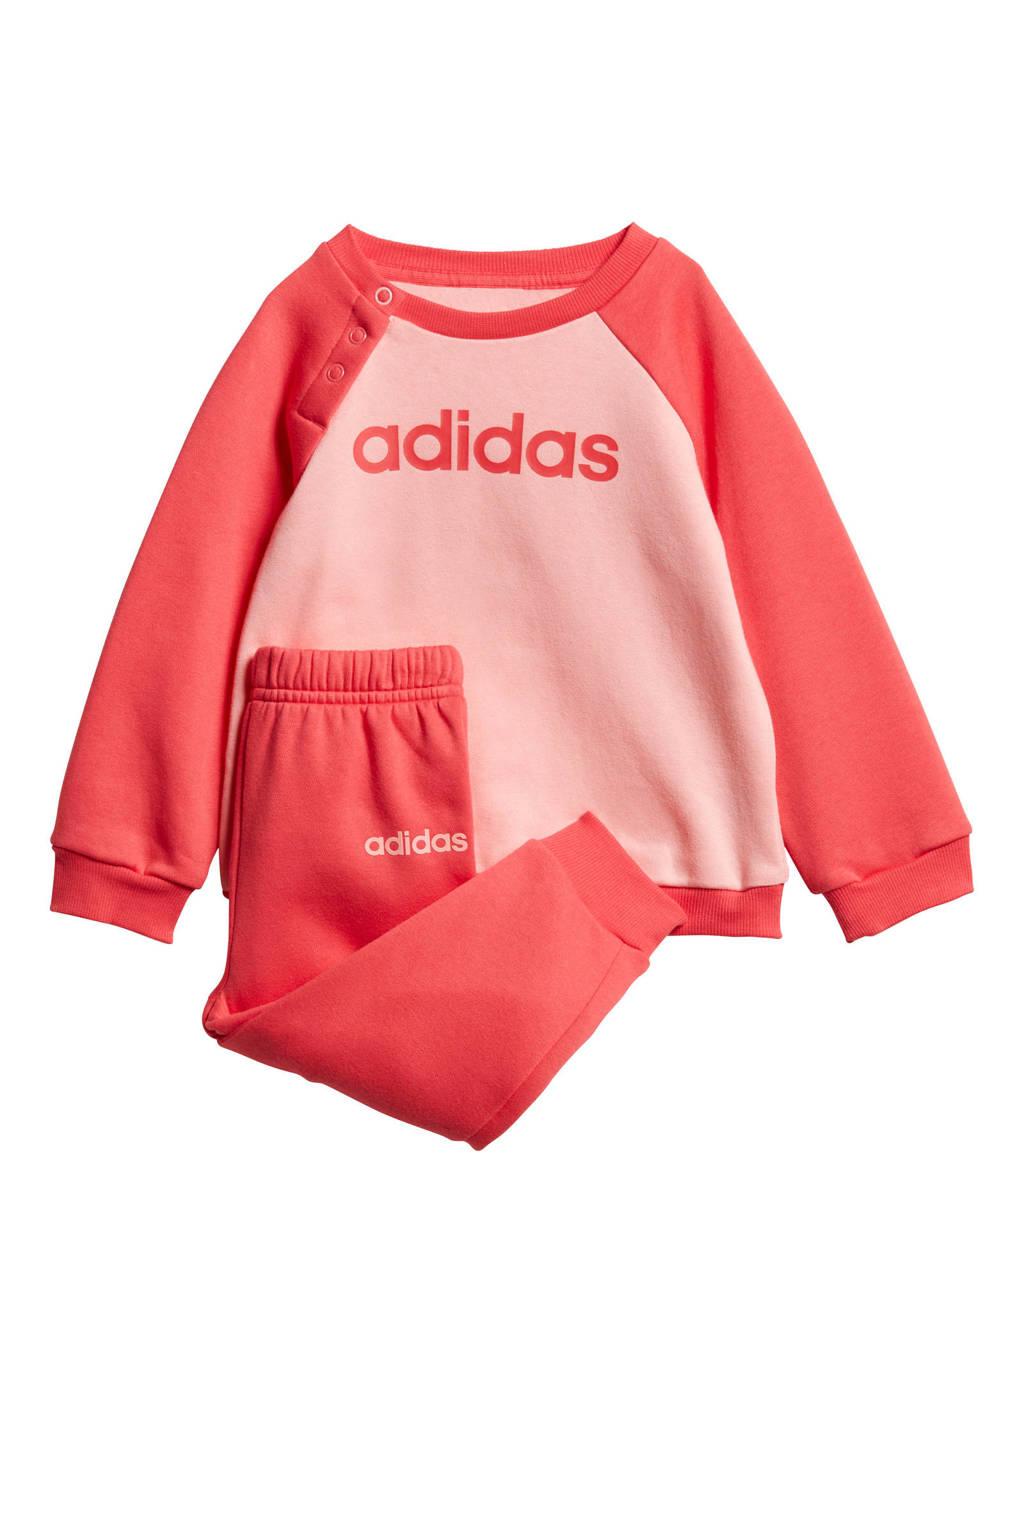 adidas Originals joggingpak roze/koraalrood, Meisjes